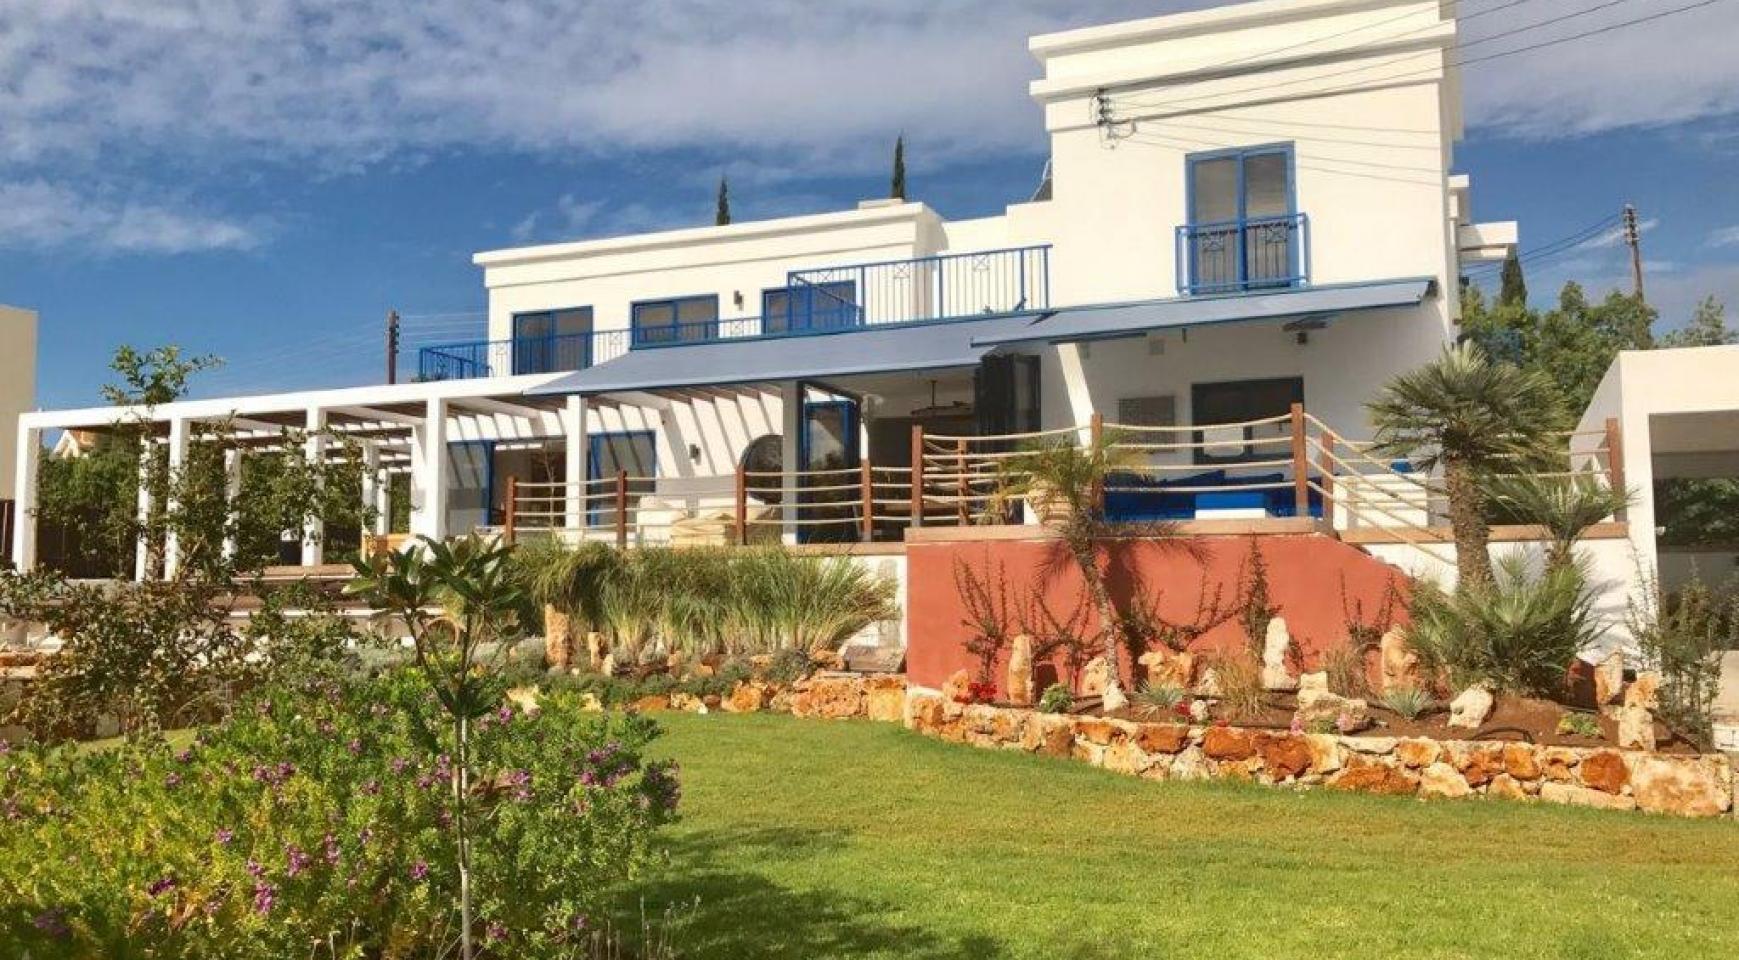 5-Спальная Вилла с видом на Море в районе  Agios Tychonas - 1